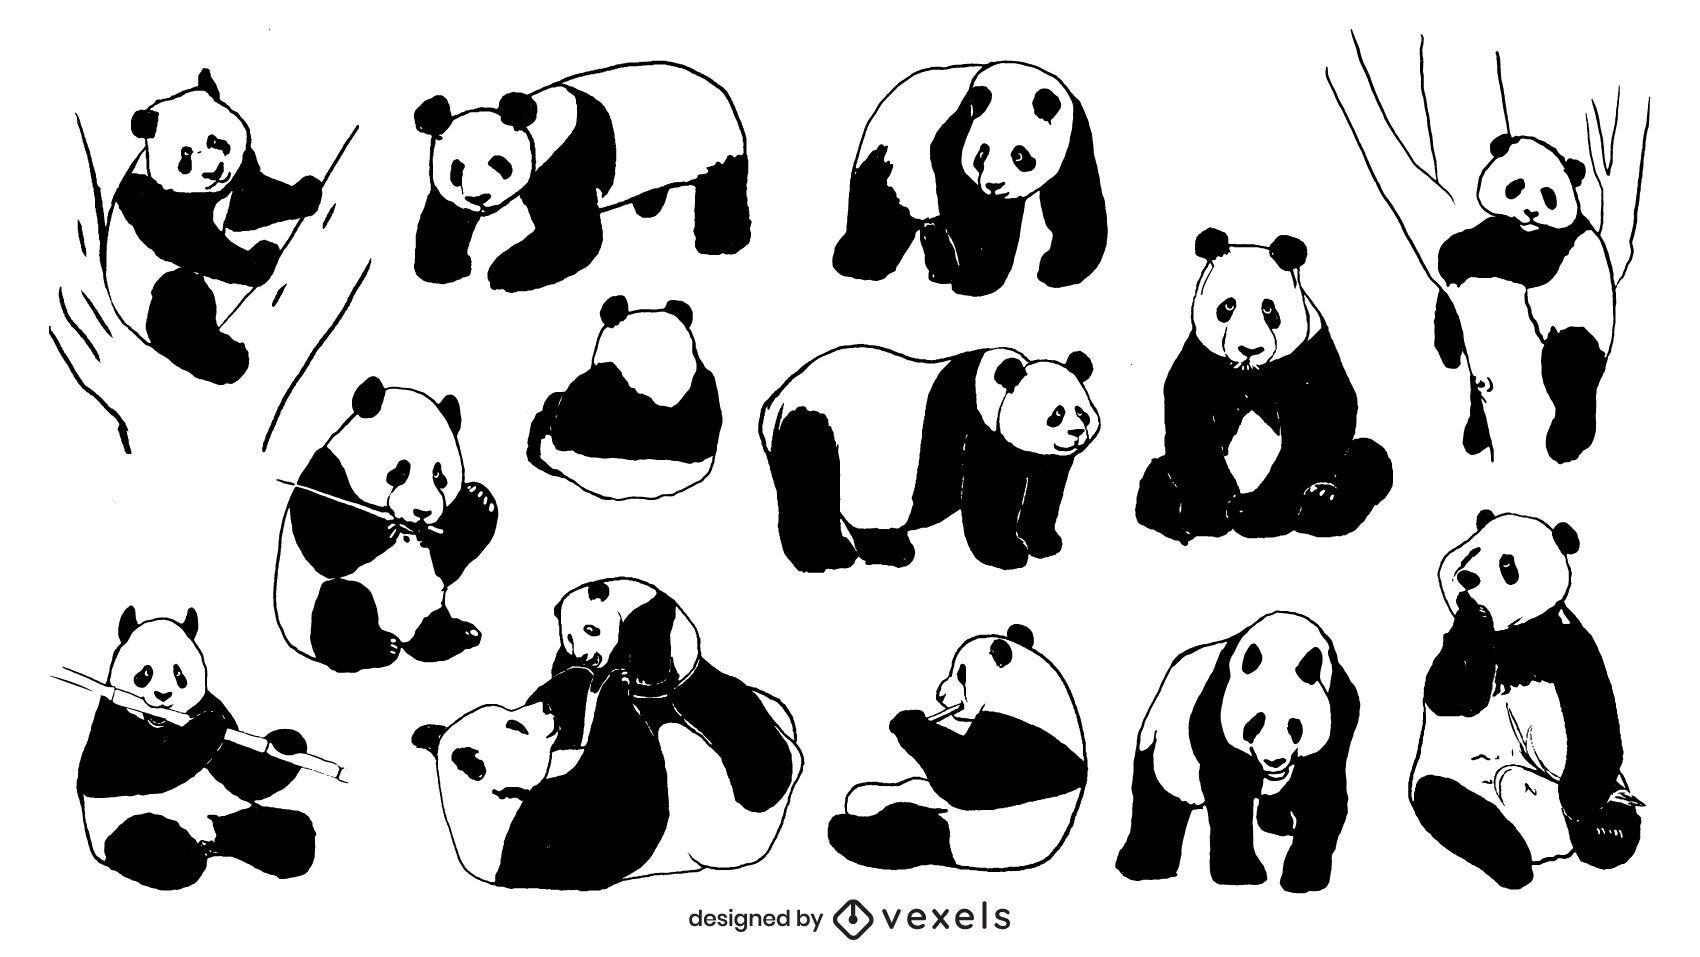 Panda hand drawn collection